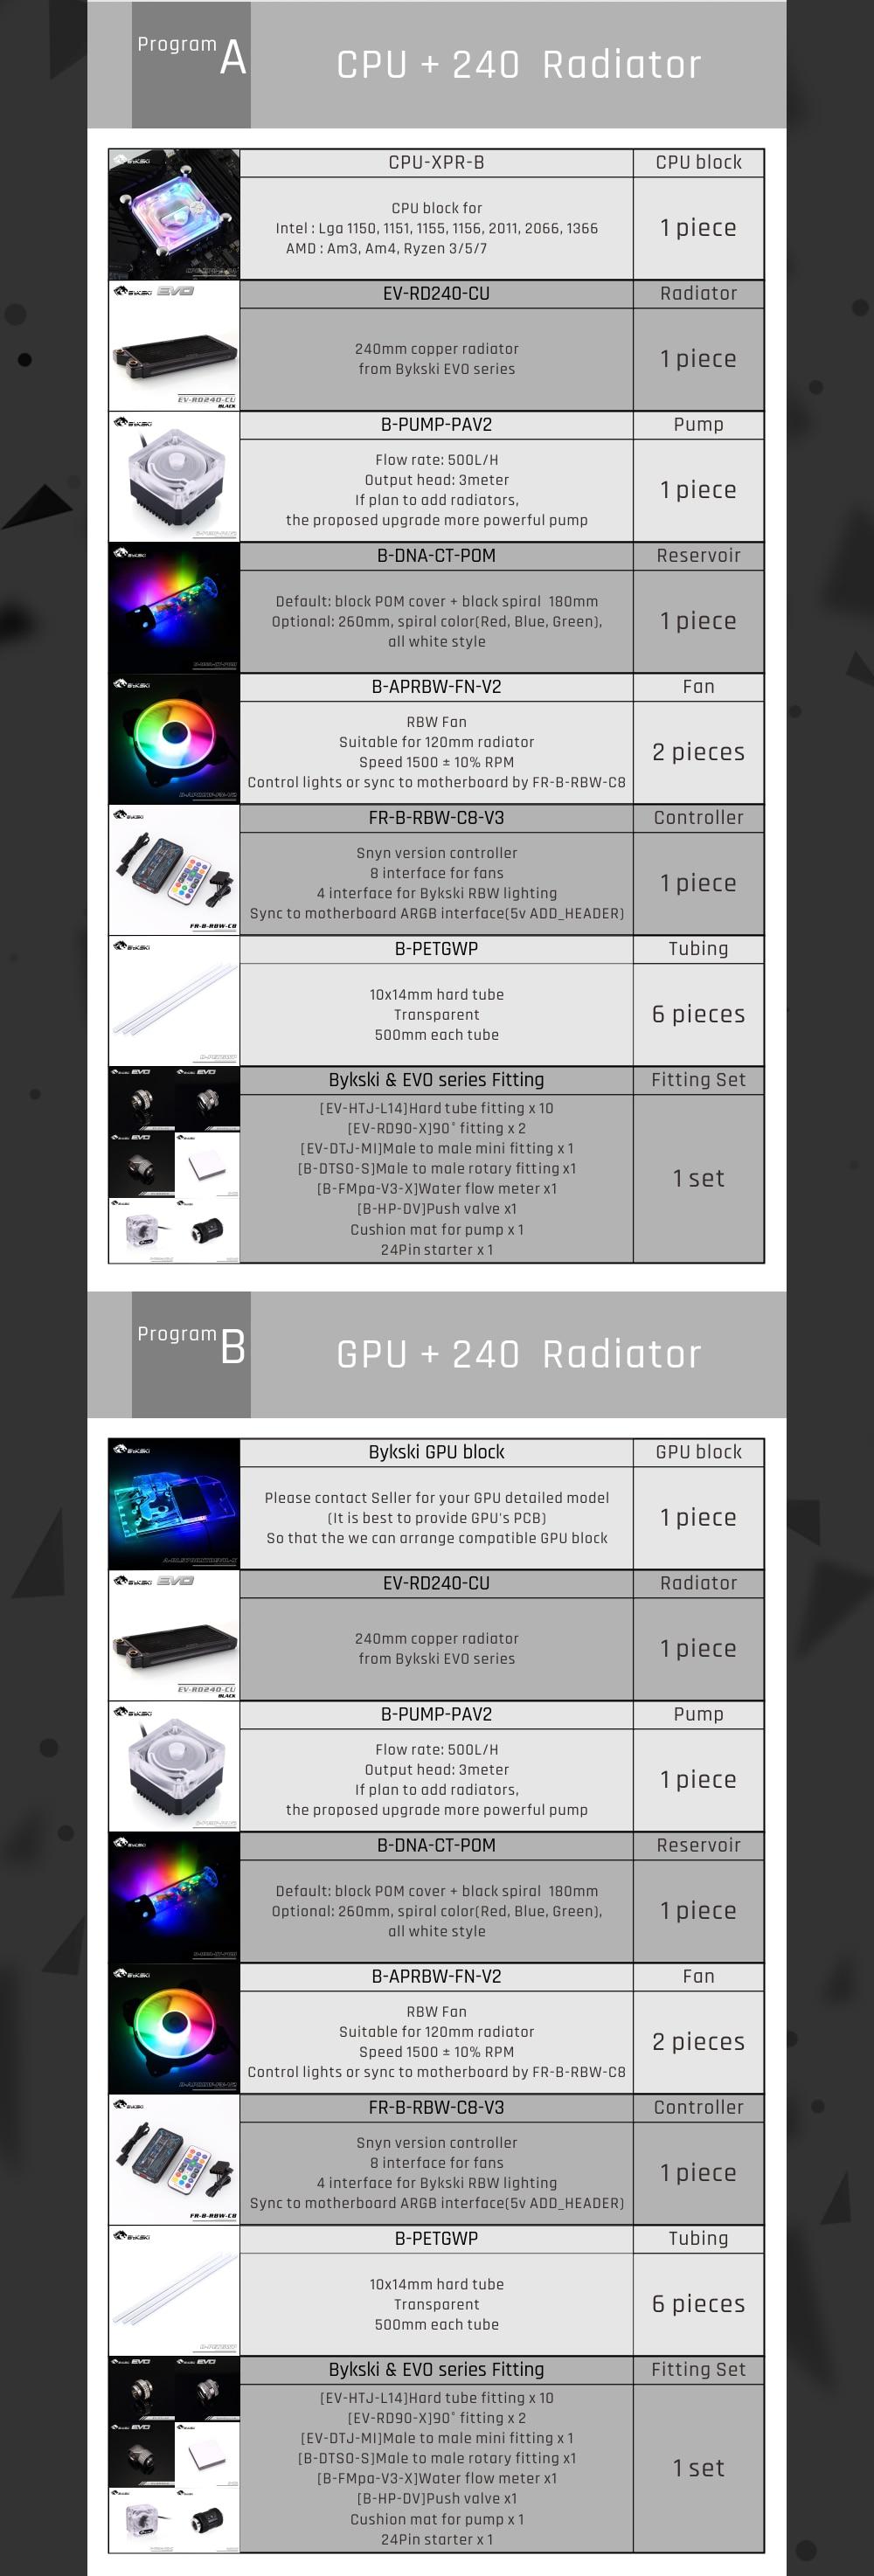 Bykski B-HTRBW-ED, RBW 5v 3pin Hard Tube Program Kits, Multiple Programs Customizable Modification For Intel/AMD Cooling KitBykski B-HTRBW-ED, RBW 5v 3pin Hard Tube Program Kits, Multiple Programs Customizable Modification For Intel/AMD Cooling KitBykski B-HTRBW-ED,Bykski RBW 5v 3pin hard tube program,Bykski AMD cooling kit